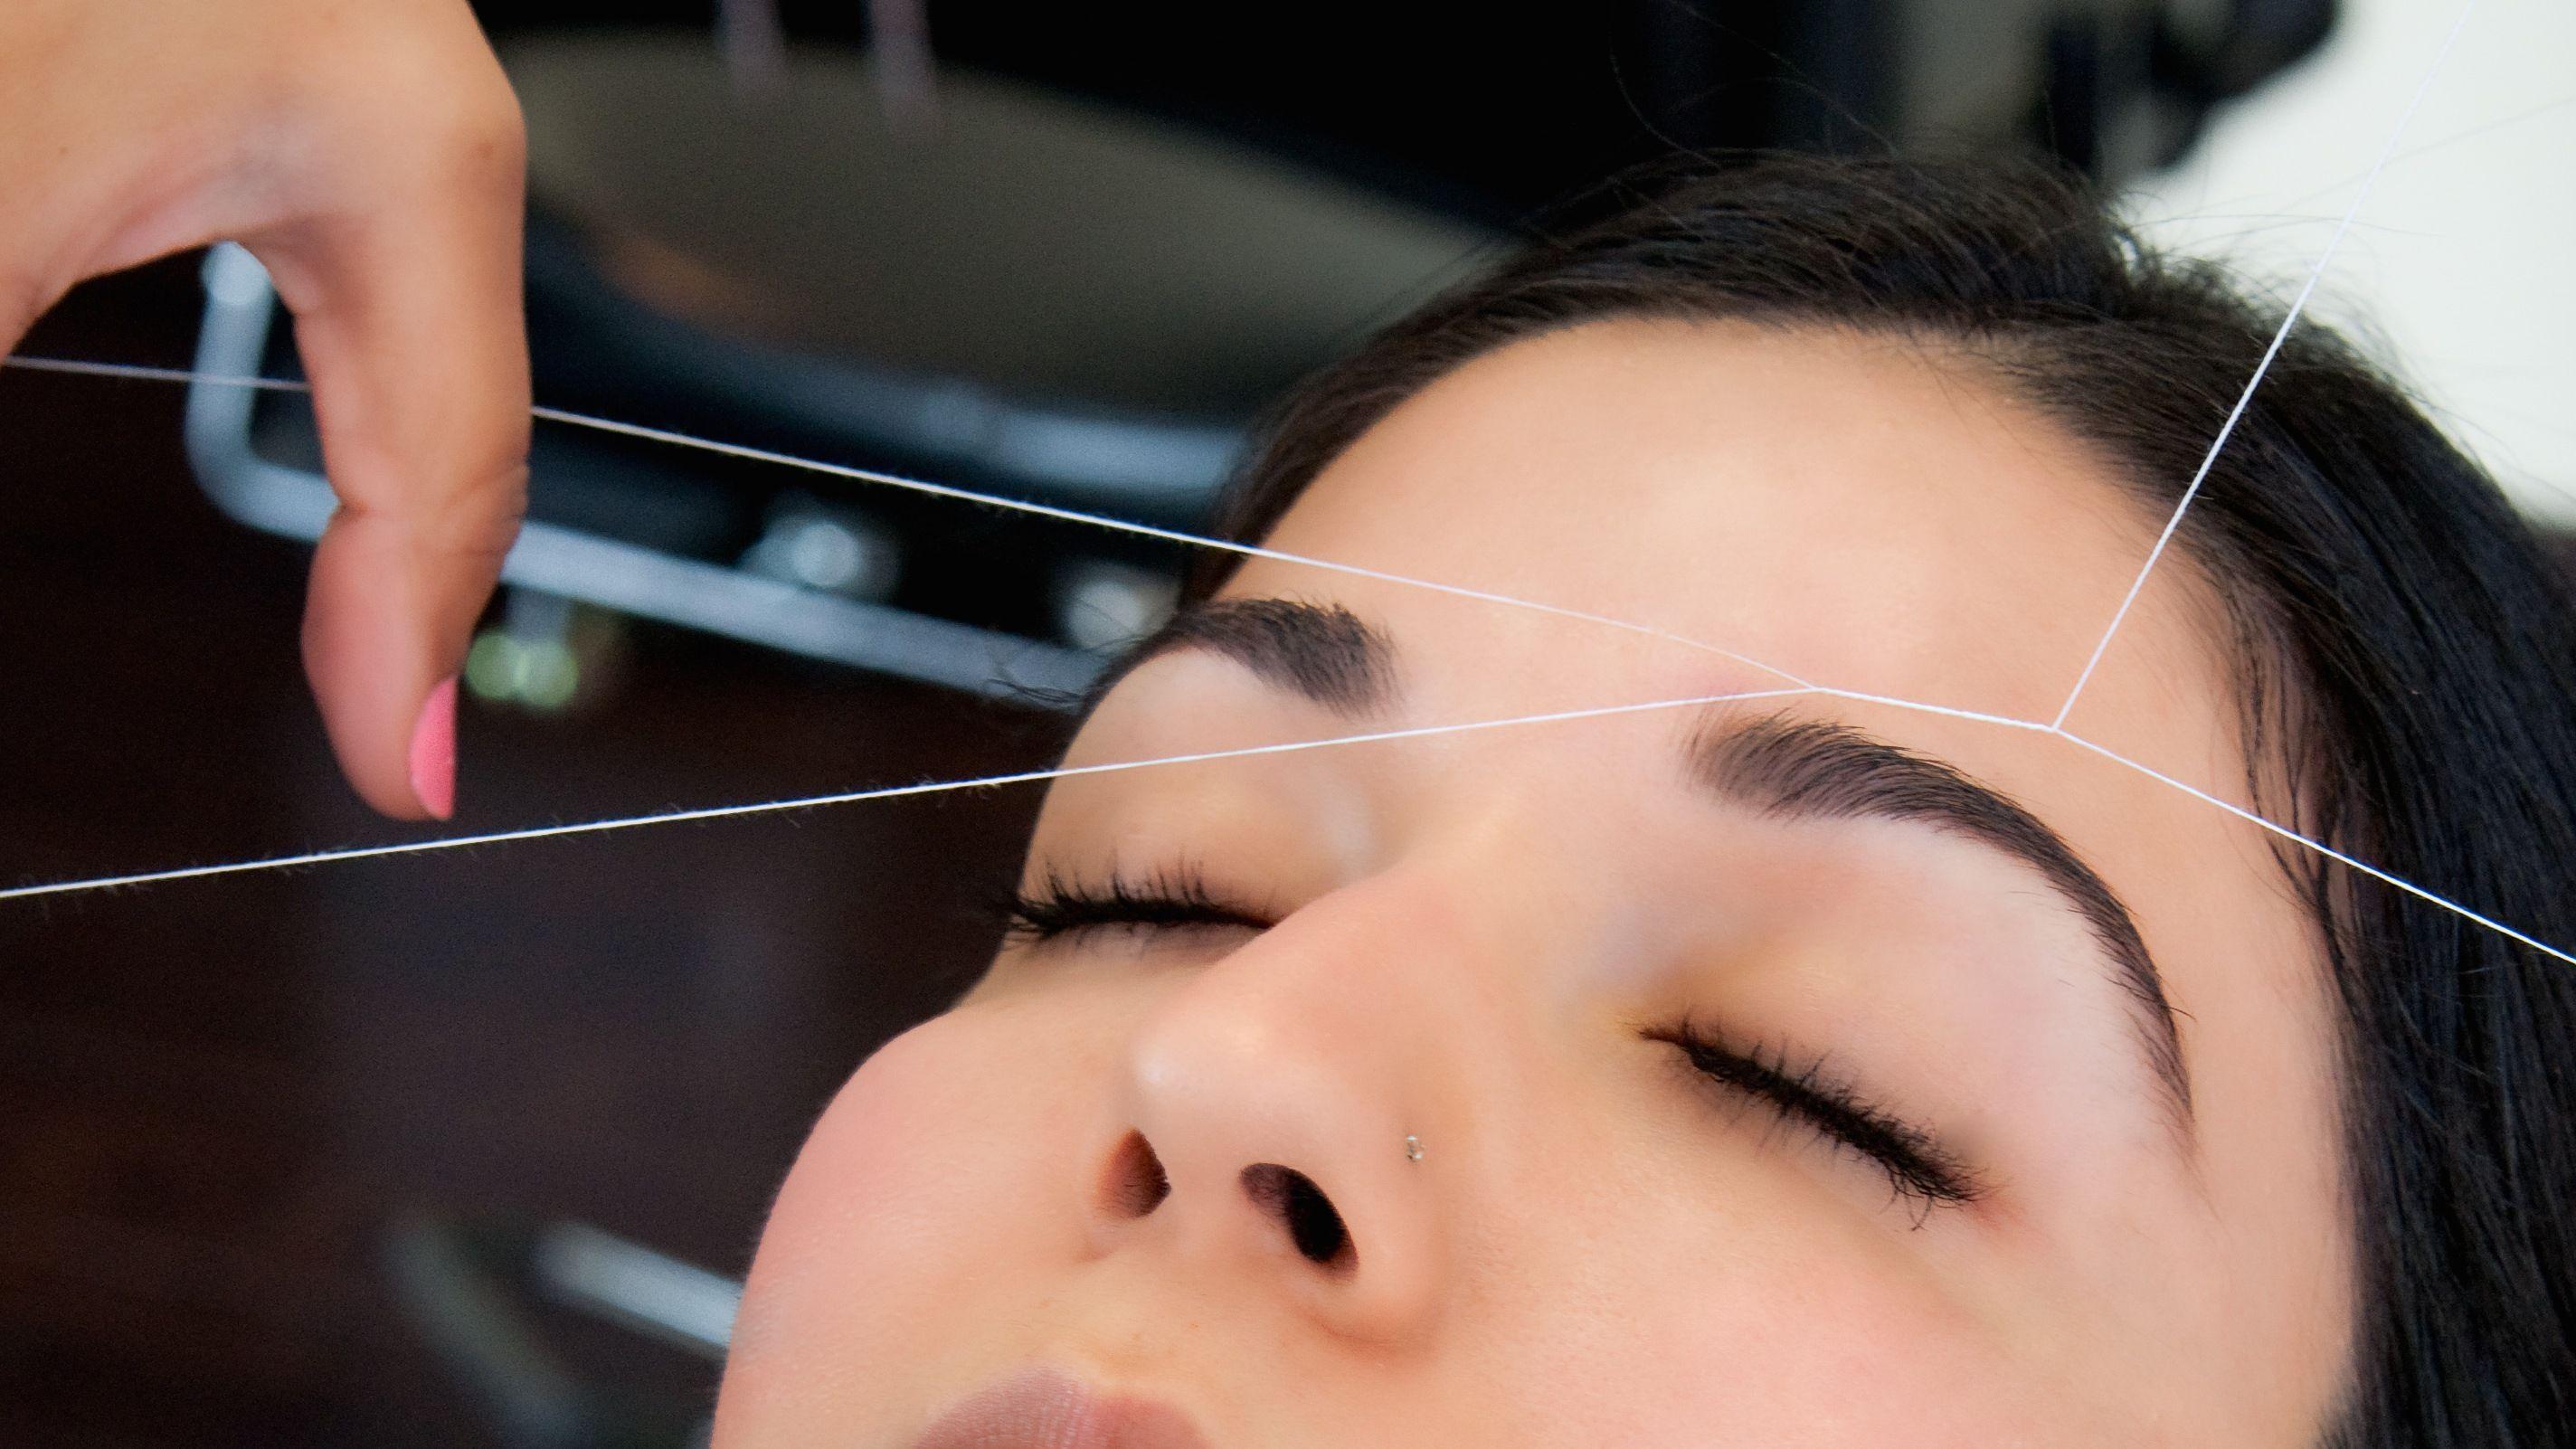 Get amazing eyebrow threading services Threading